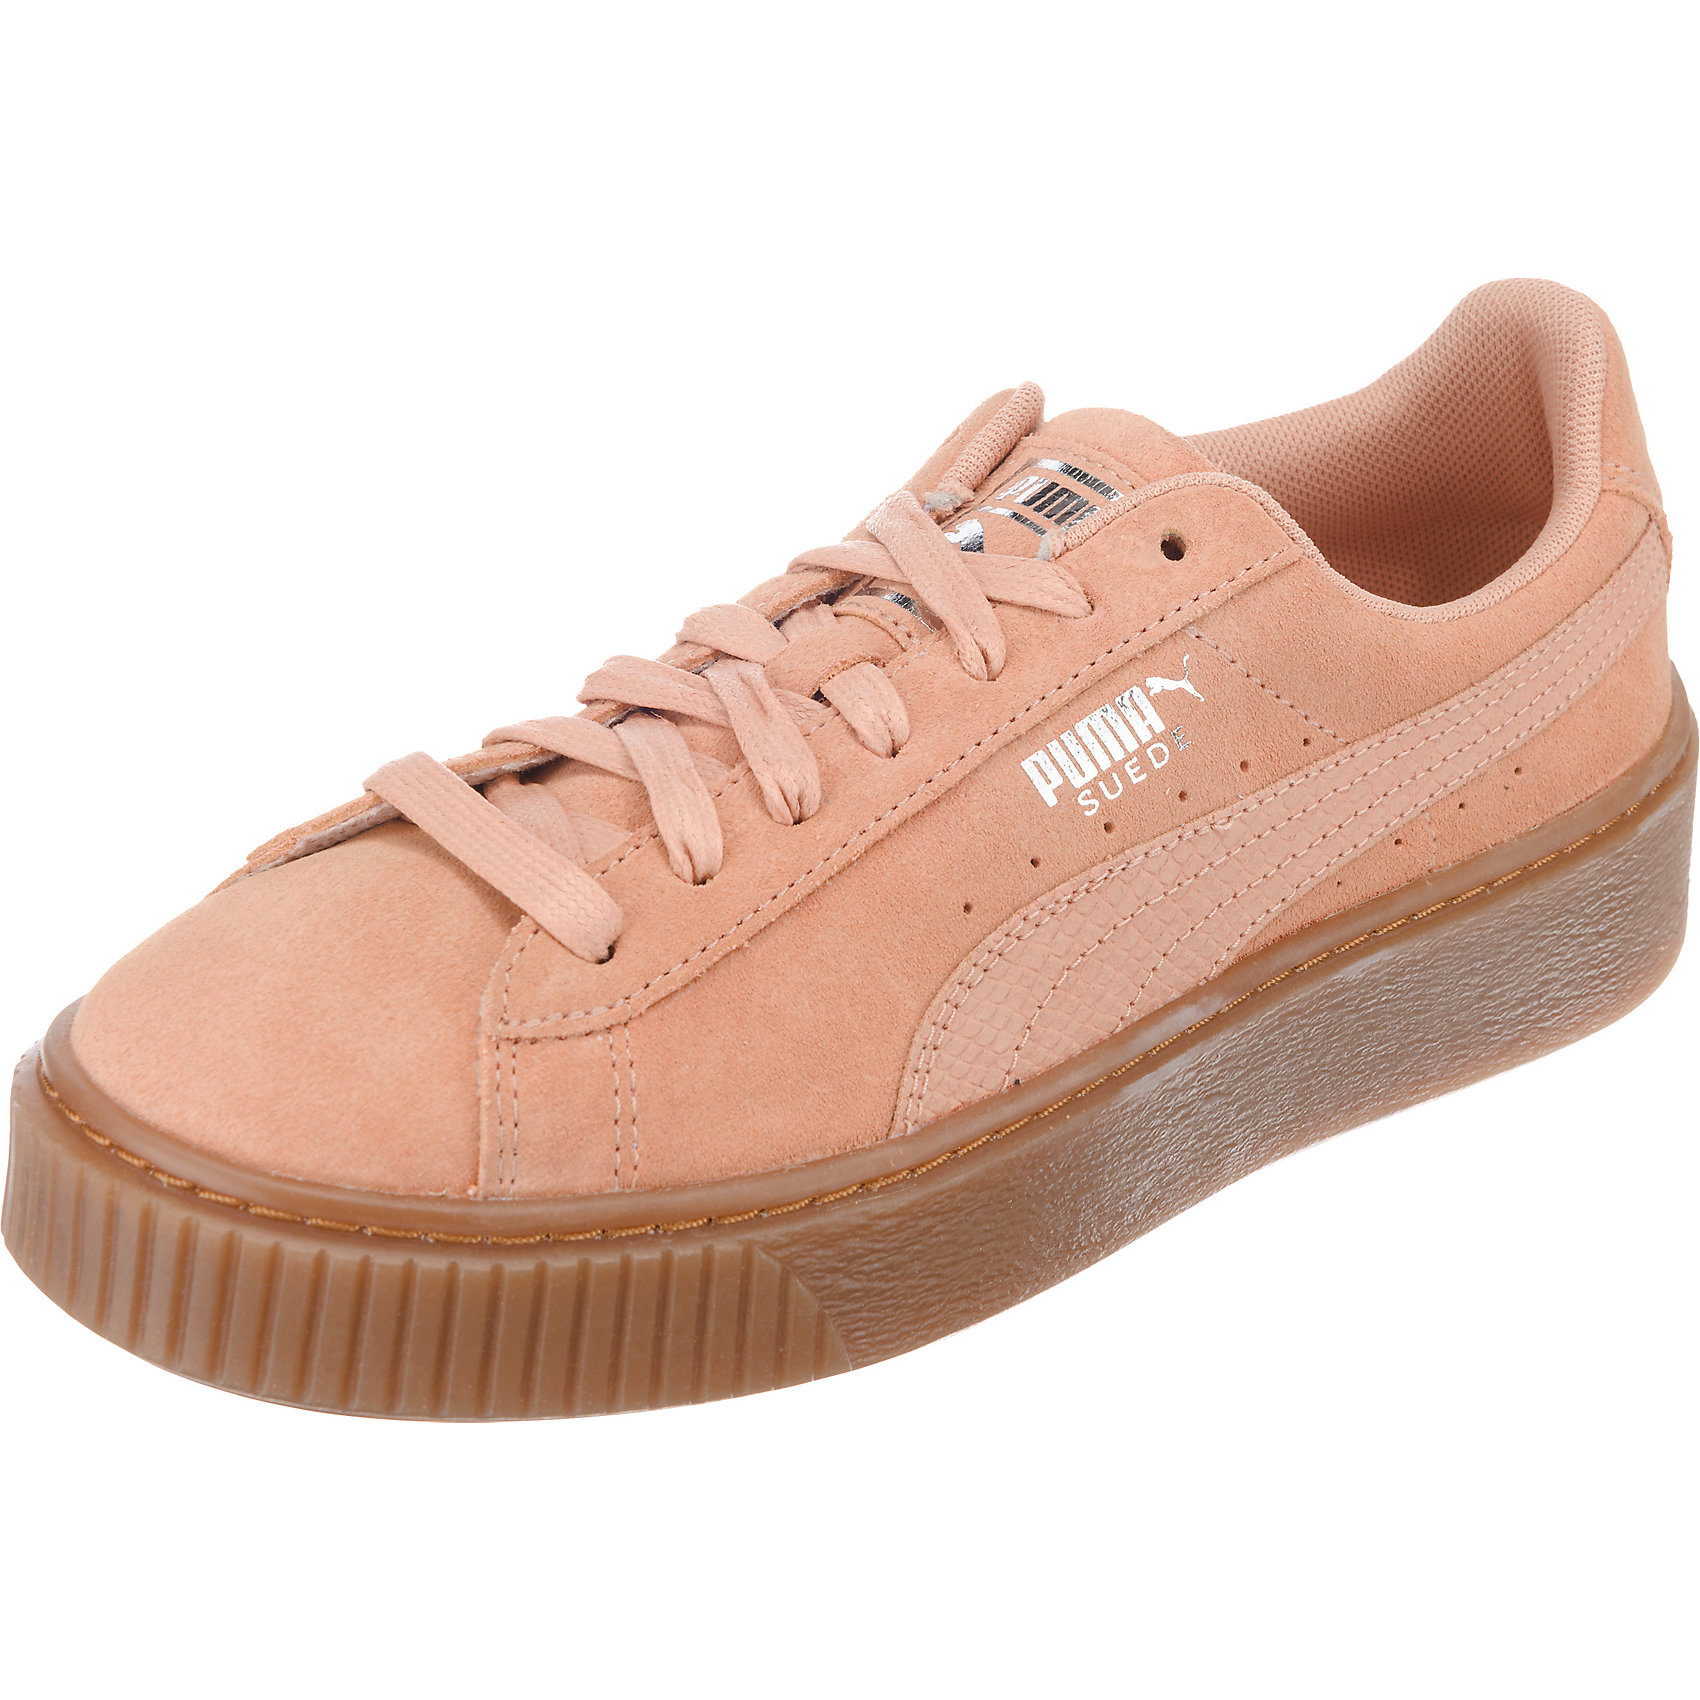 Suede Platform Damen Sneakers Low Neu 8679824 Für Puma Animal ZPXkiu